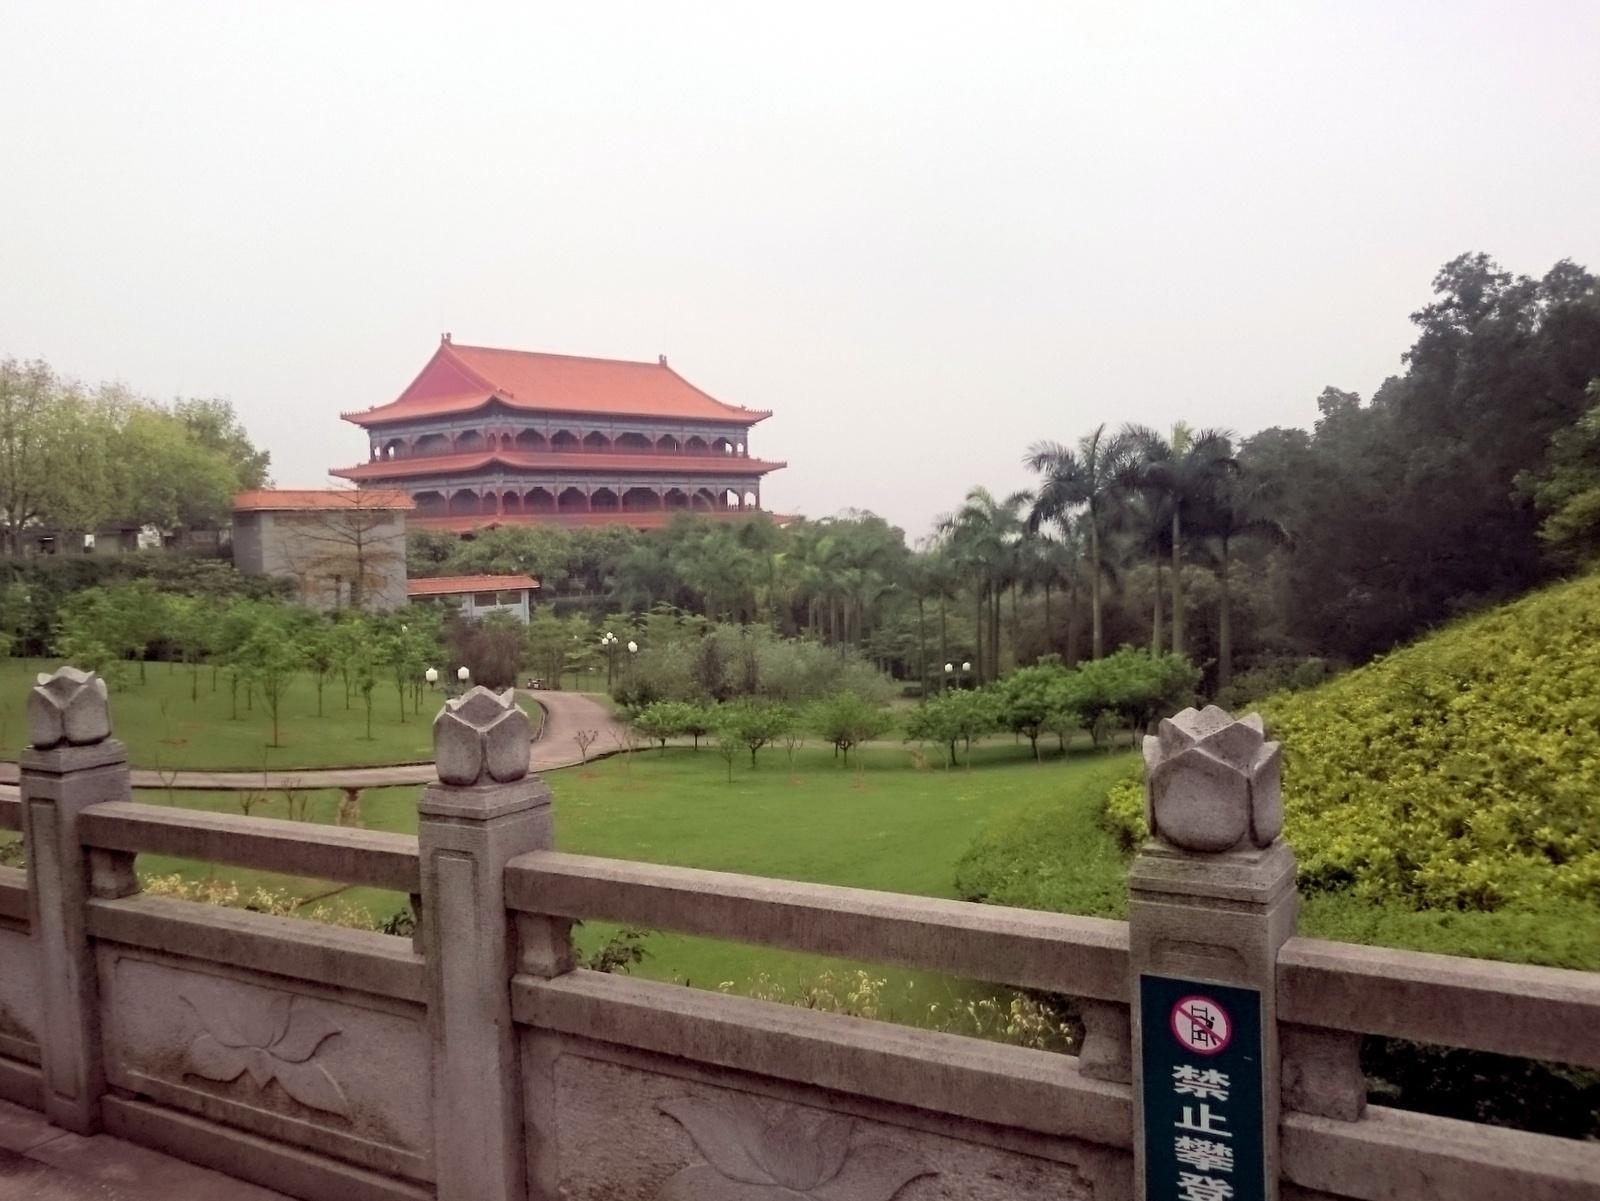 Китай. Завод устройств для «Умного дома». Учимся и учим - 41